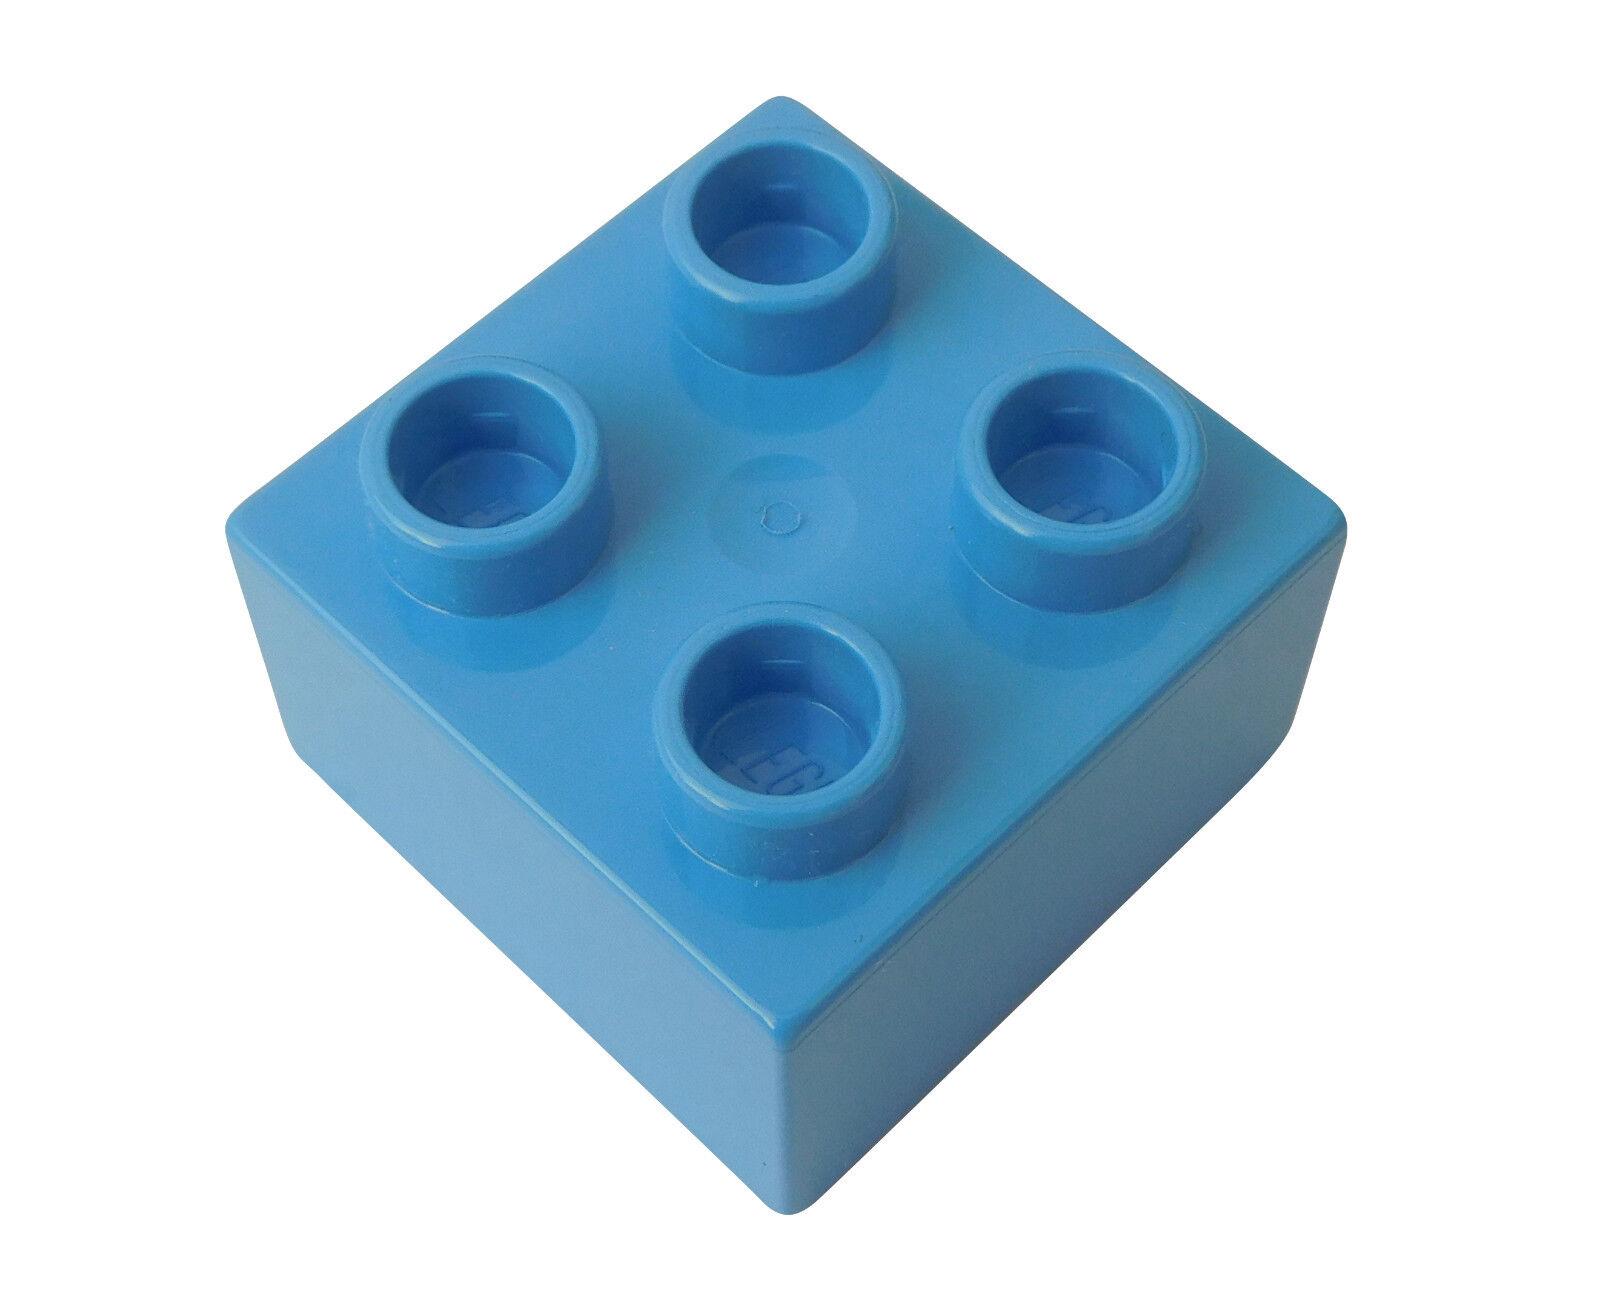 3003 Lego 50 Piece Stone 2x2 in Blue New Blue Bricks Brick Block Basics